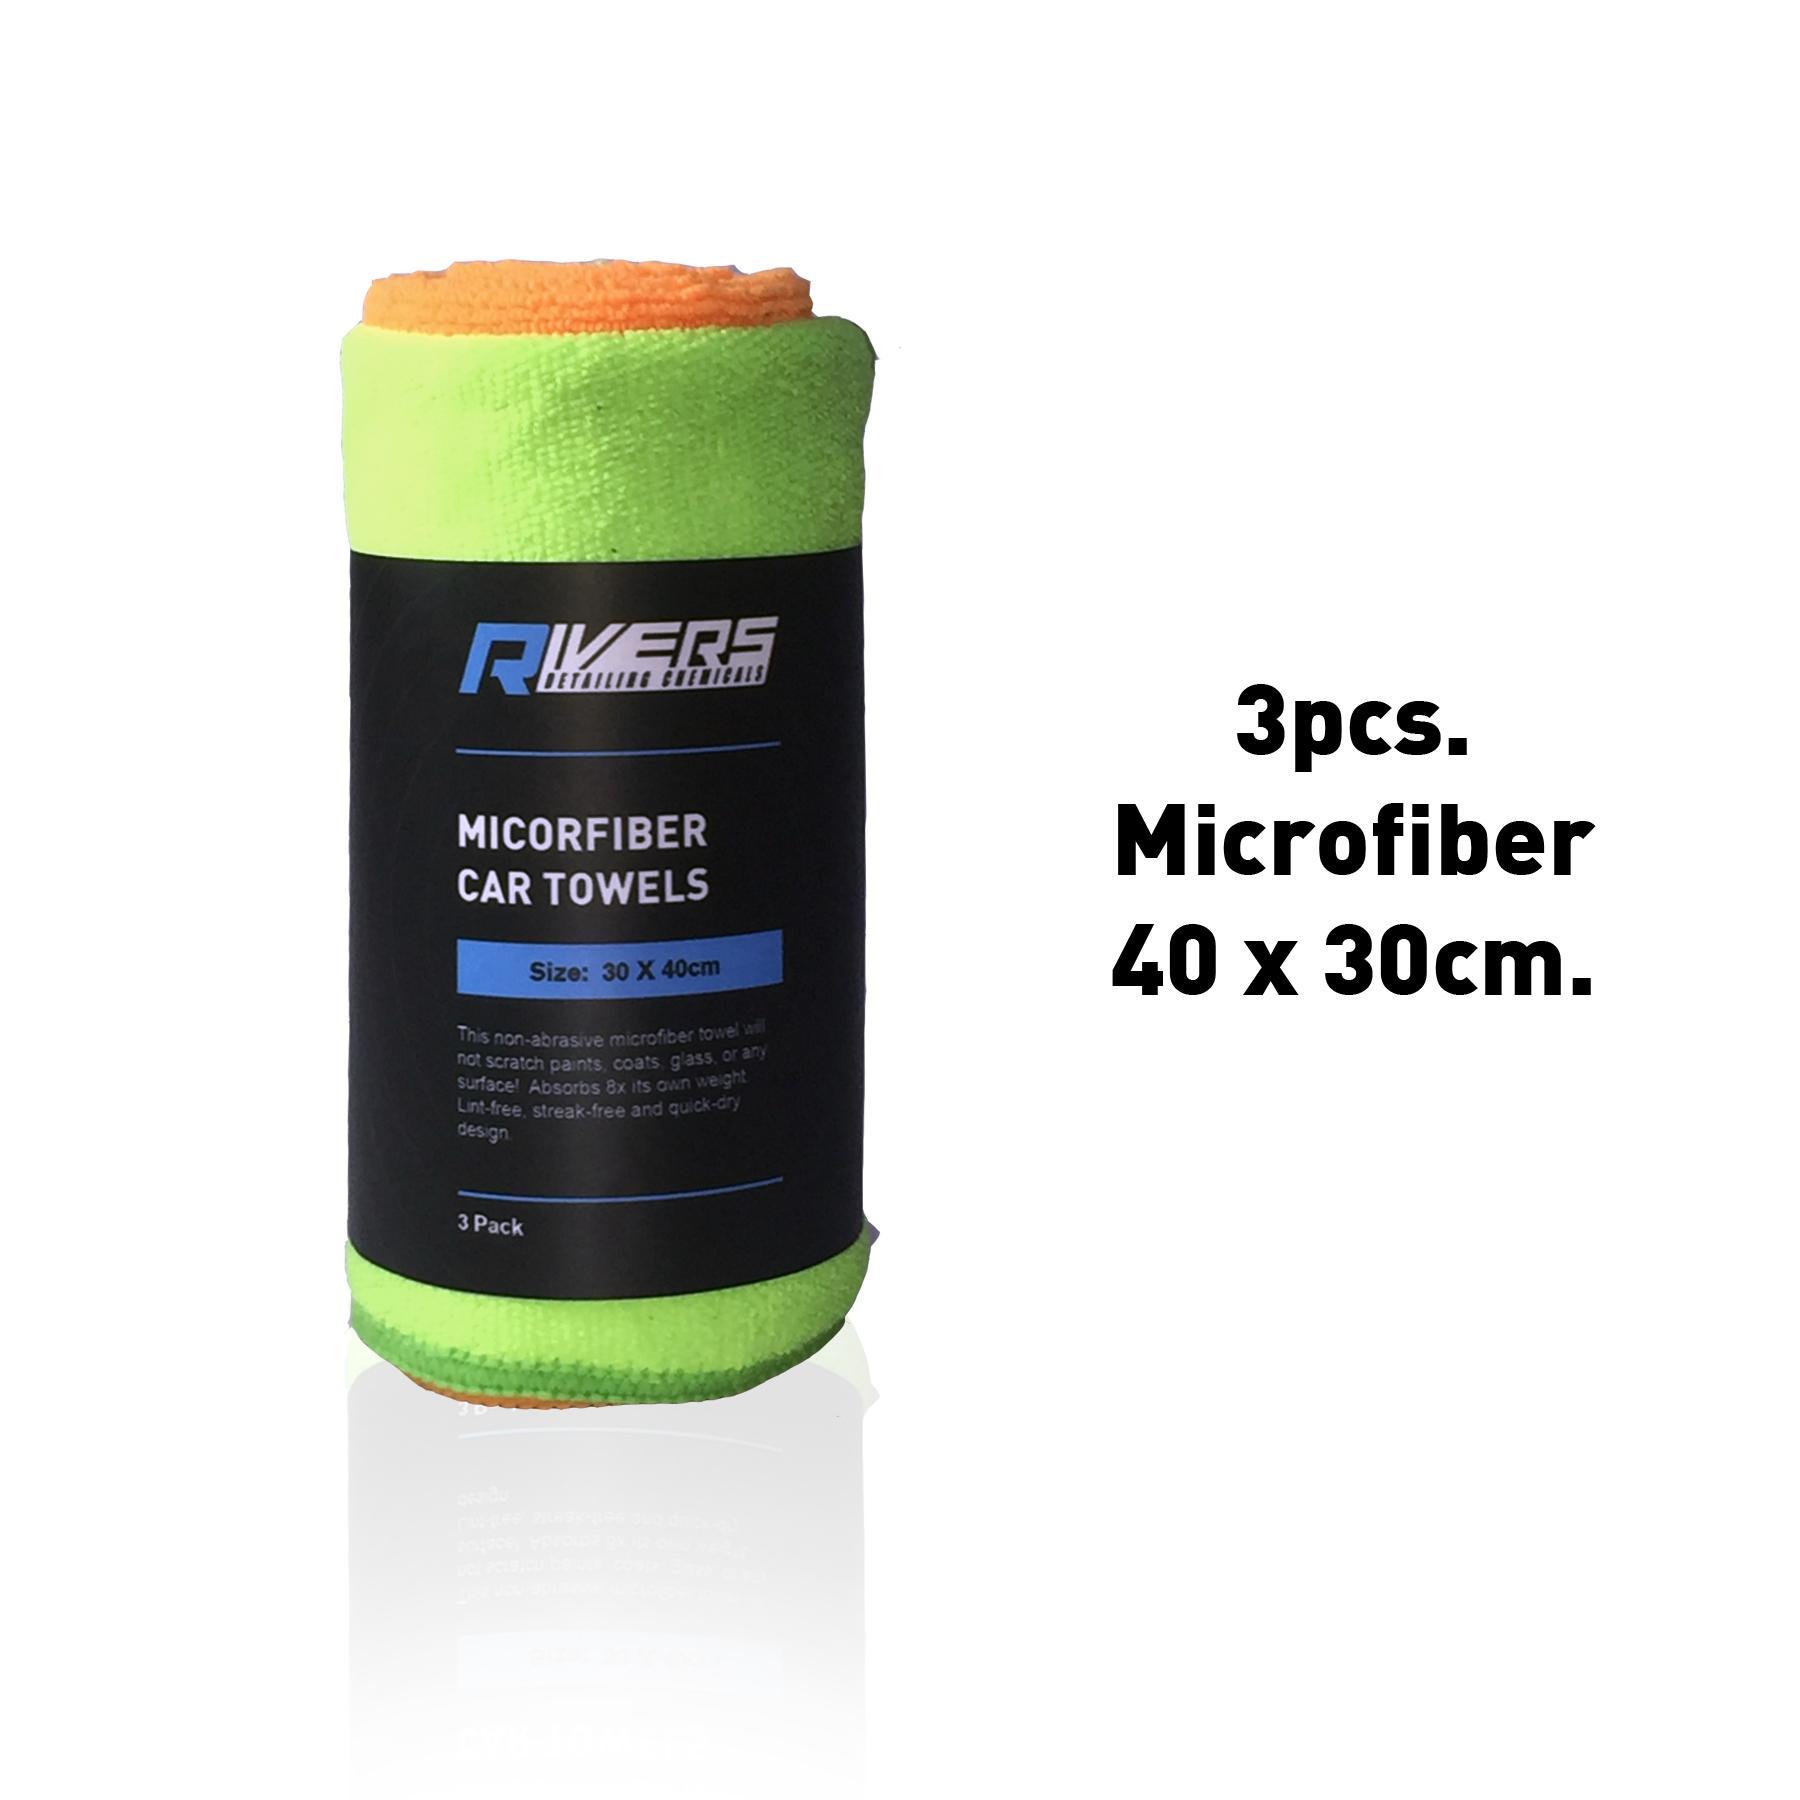 Rivers Microfiber 3 Pcs. Car Towels 40x30cm By Rivers..